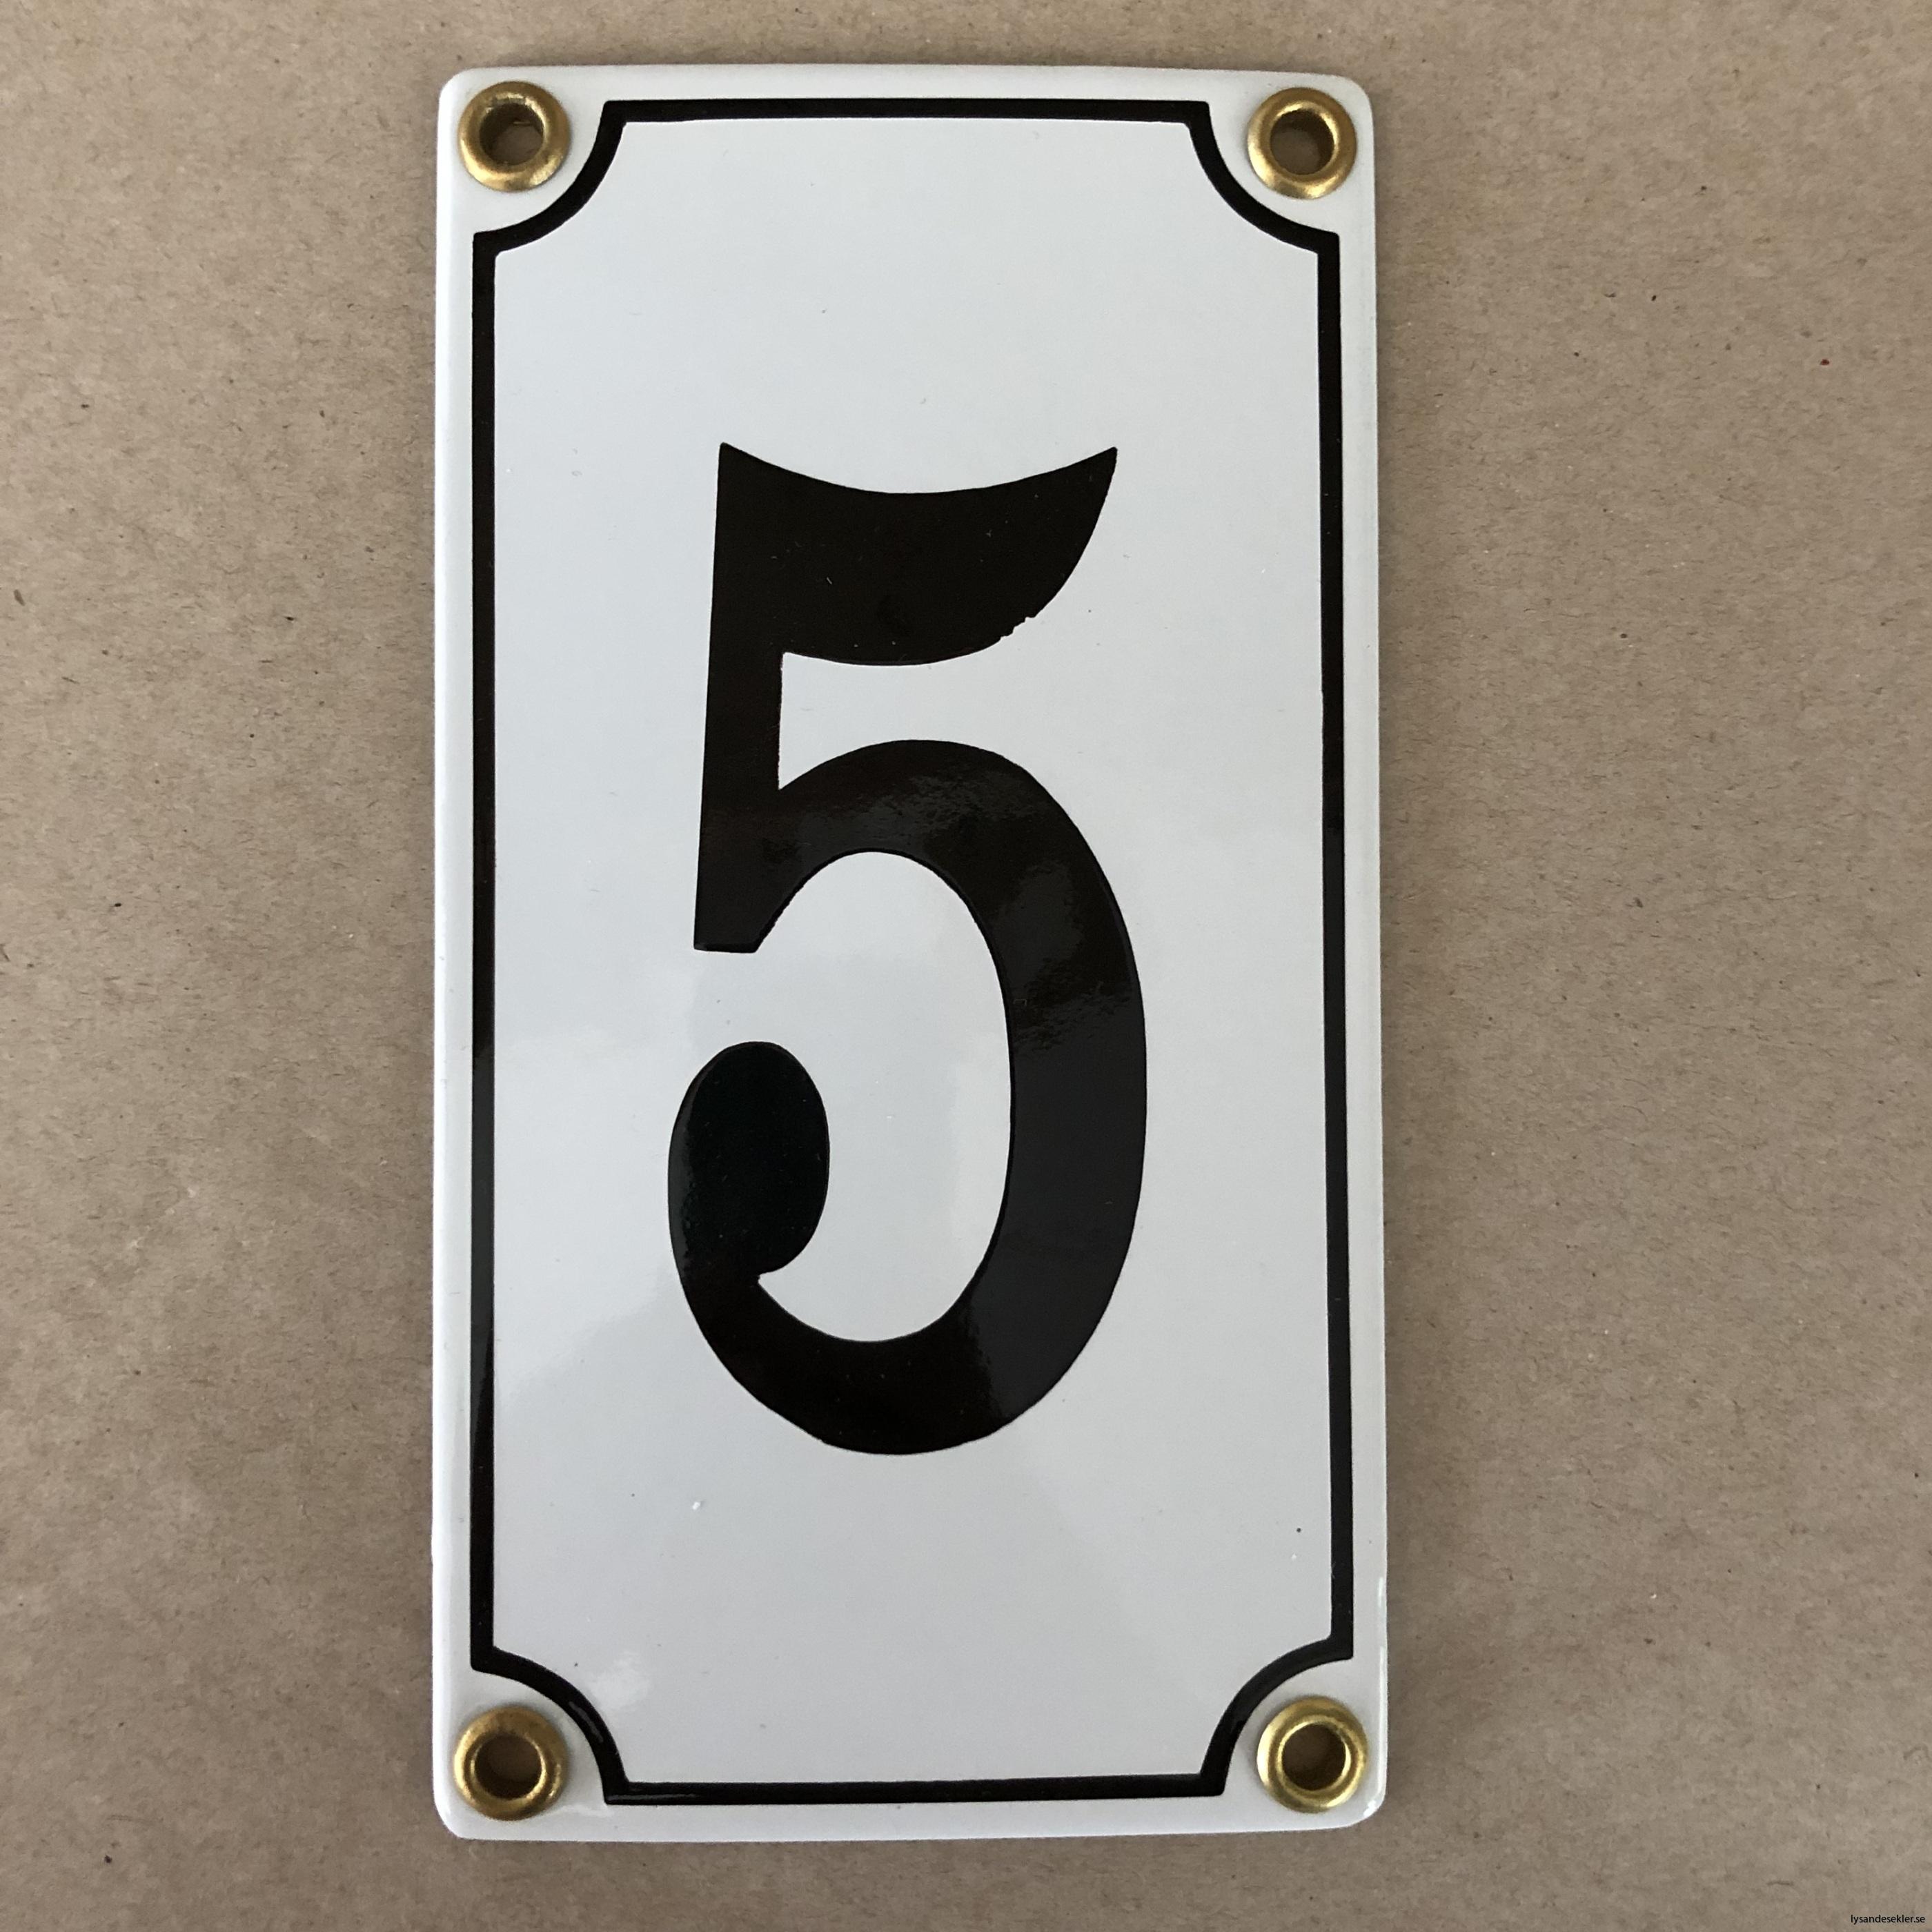 emaljsiffra siffra i emalj fasadsiffra nummer17